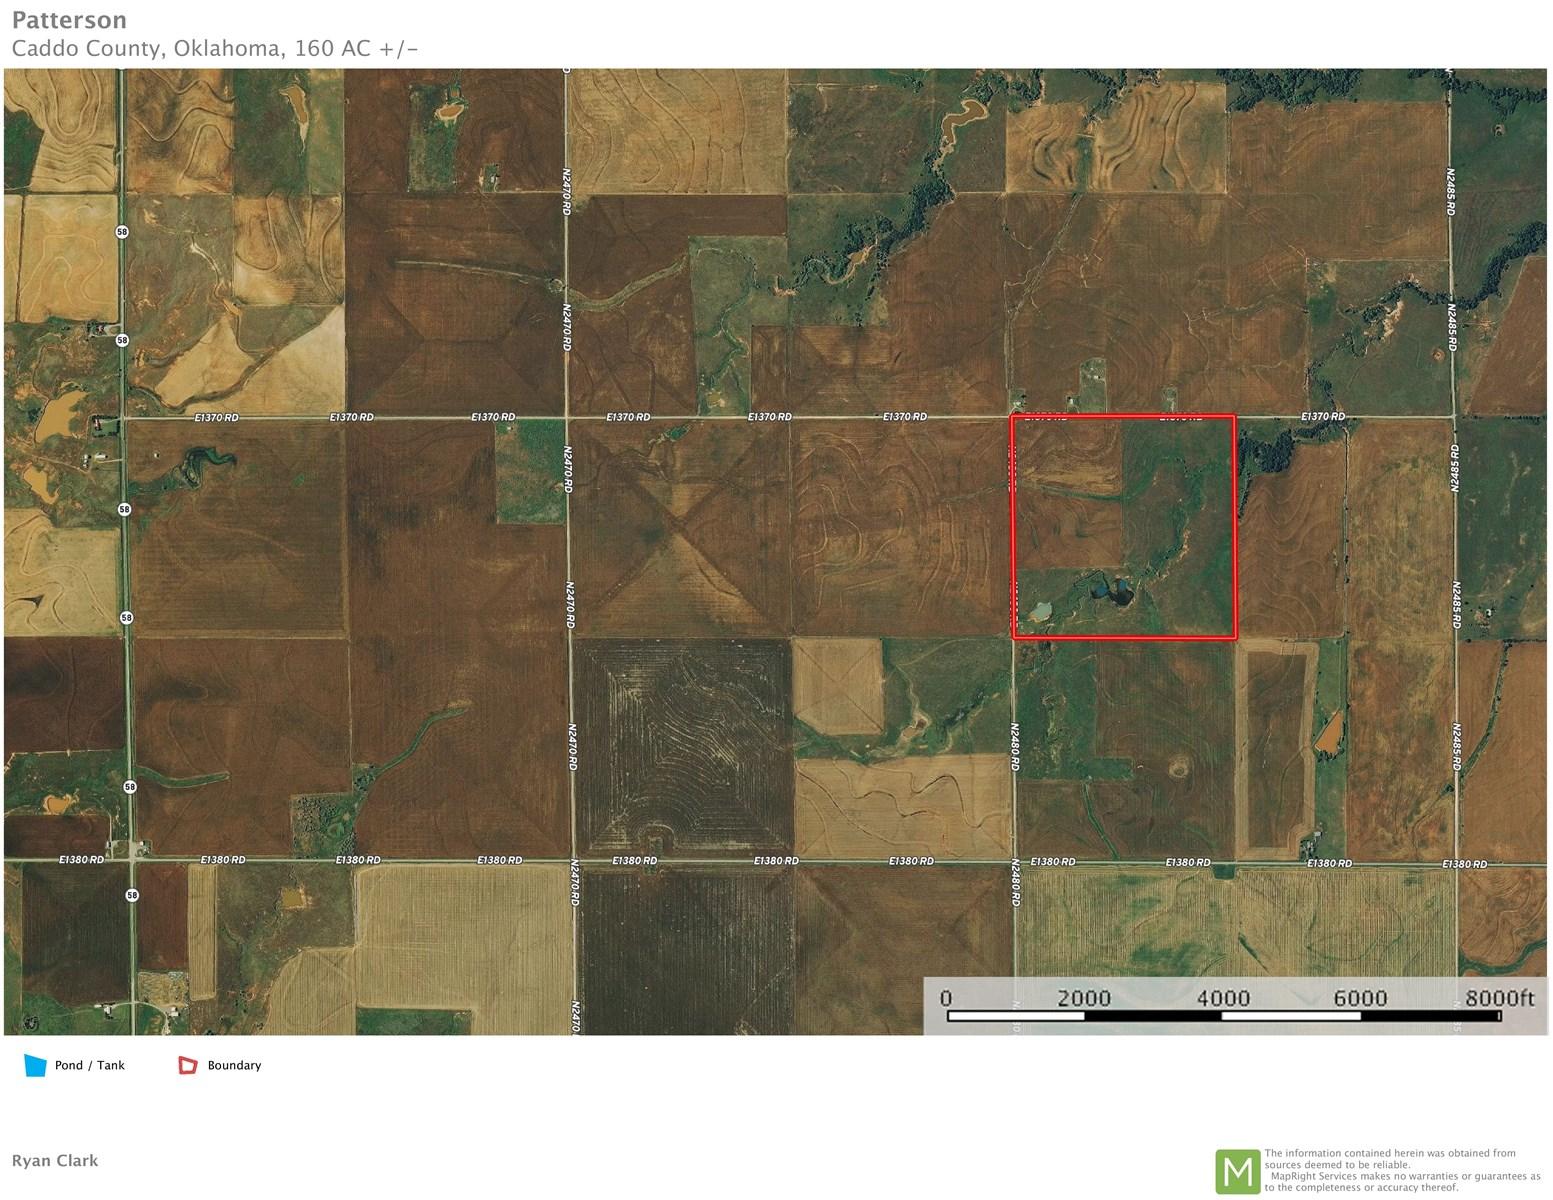 Oklahoma Farm/Ranch Land for Sale - Caddo County ±160 Acres